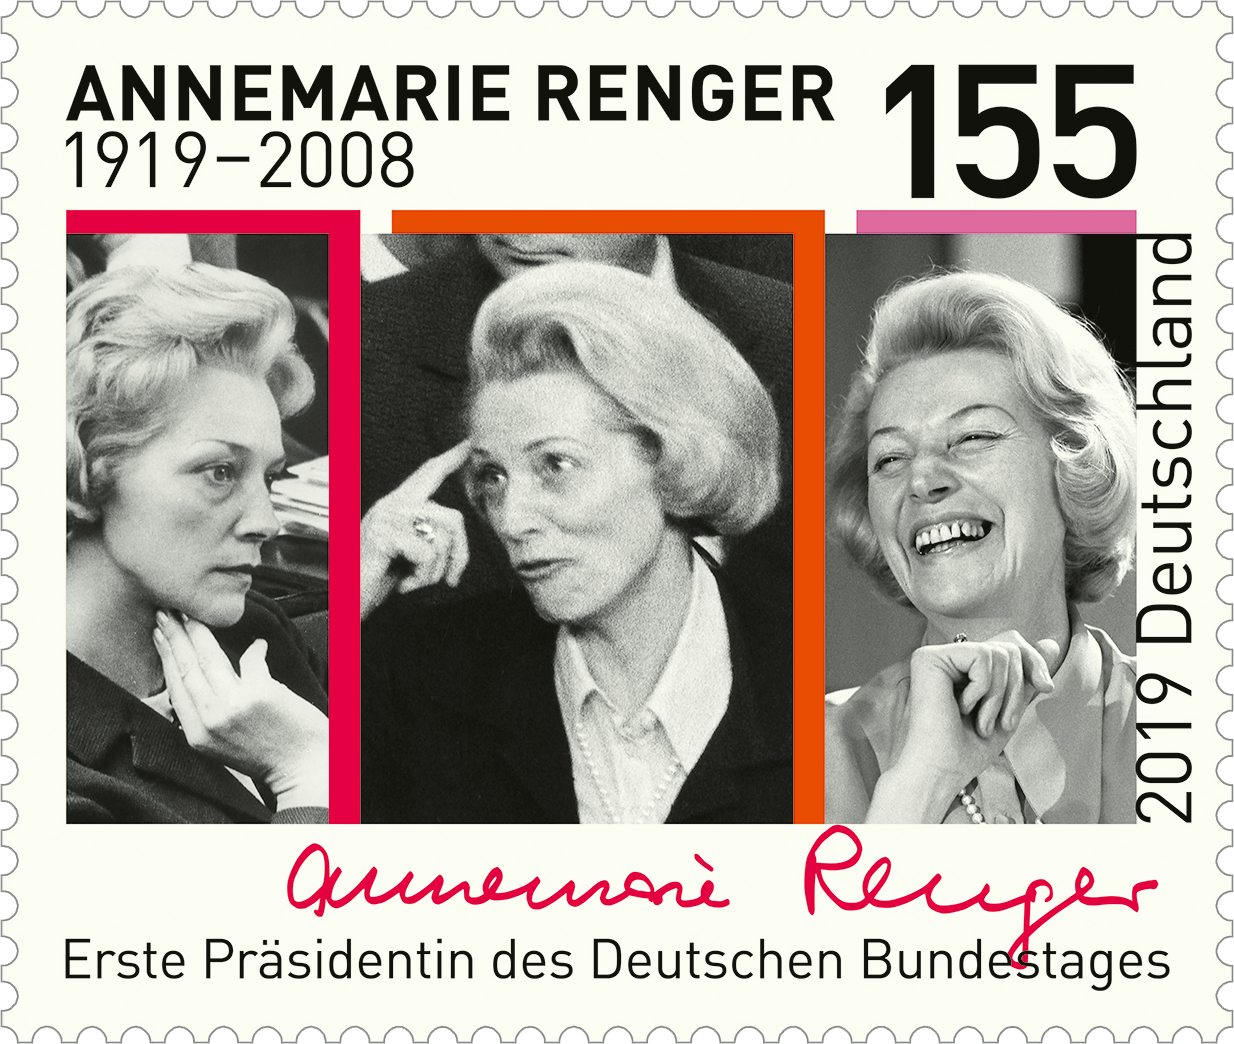 https://www.borek.de/briefmarke-100-geburtstag-annemarie-renger